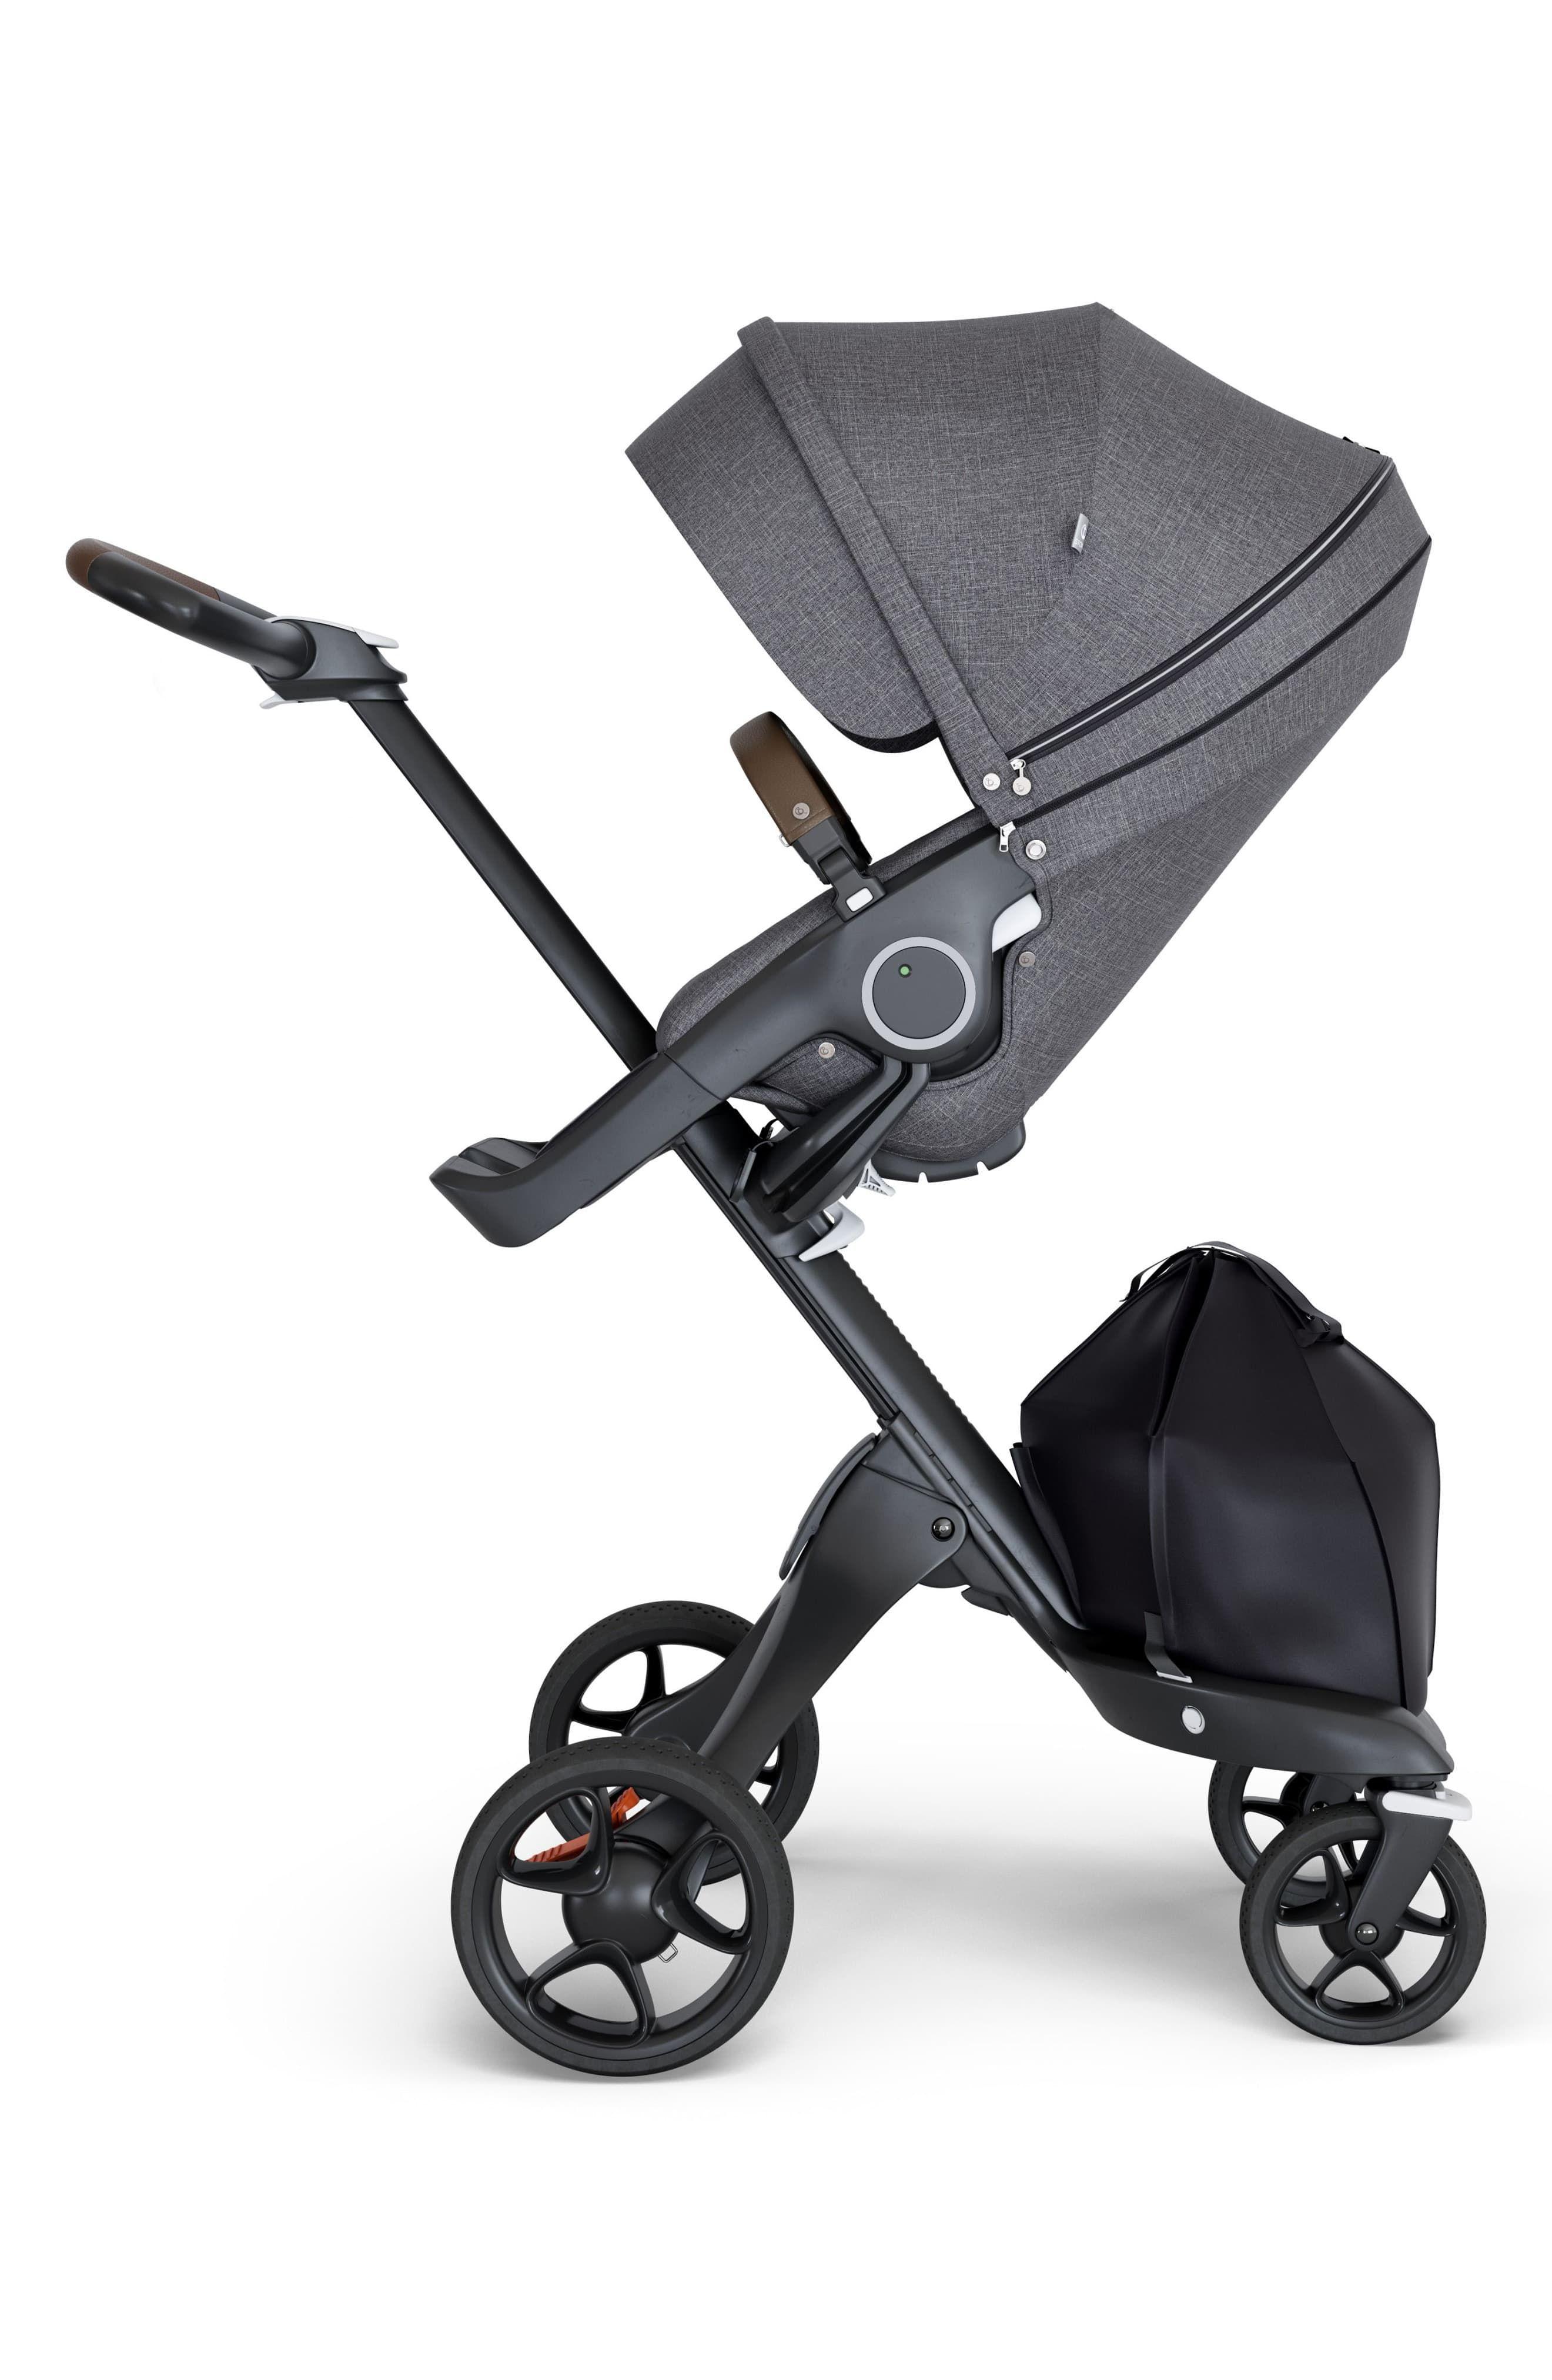 Infant Stokke Xplory Black Chassis Stroller, Size One Size